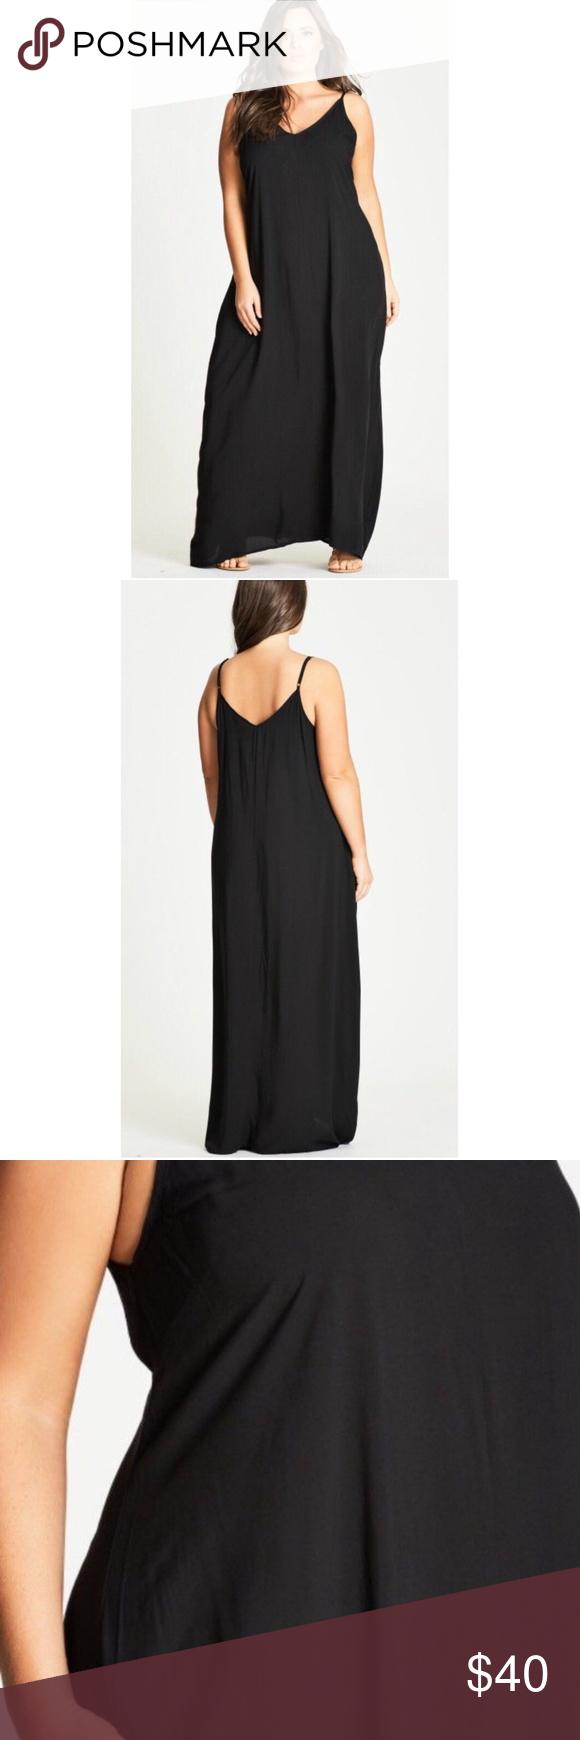 e8c381f6ea City Chic Maxi Dress 16W 1X Black Sleeveless City Chic Maxi Dress 16W 1X  Black Sleeveless